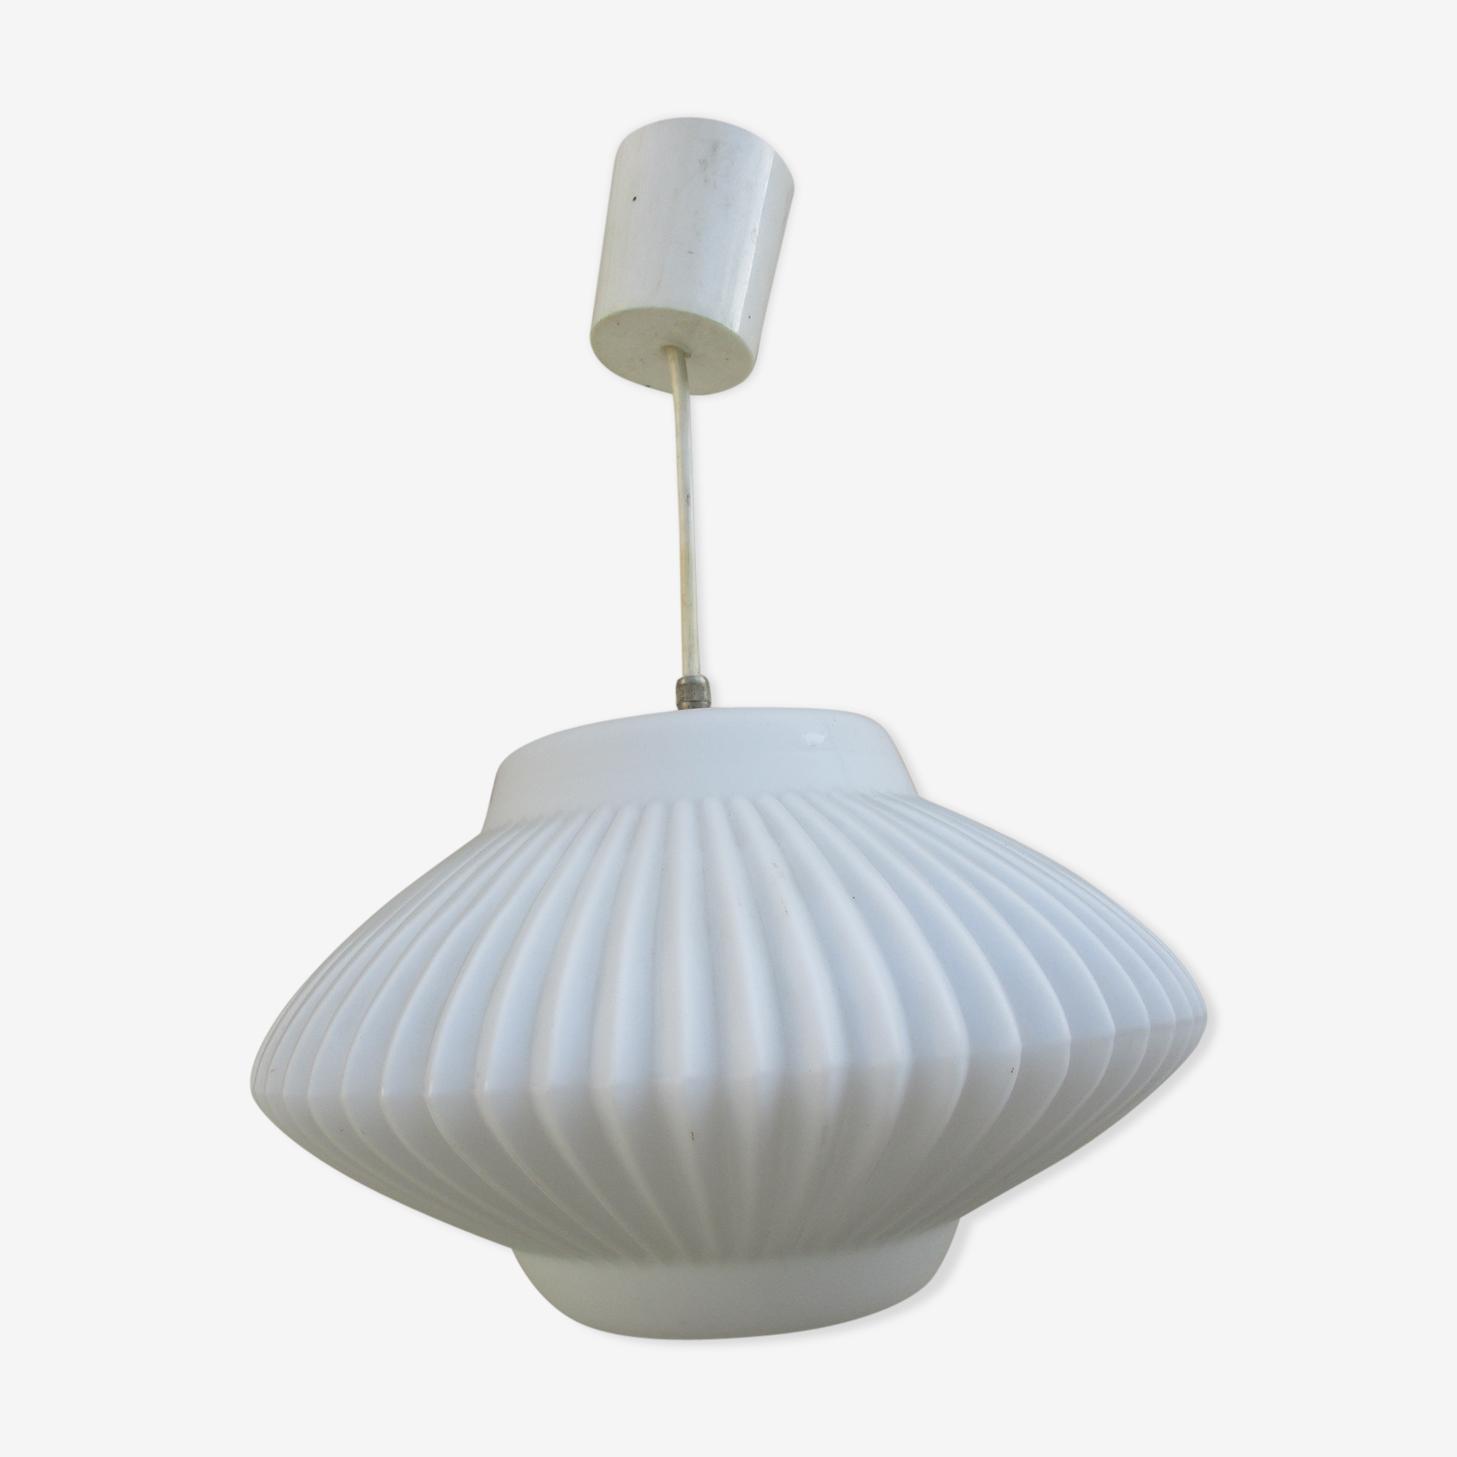 Scandinavian opaline hanging lamp